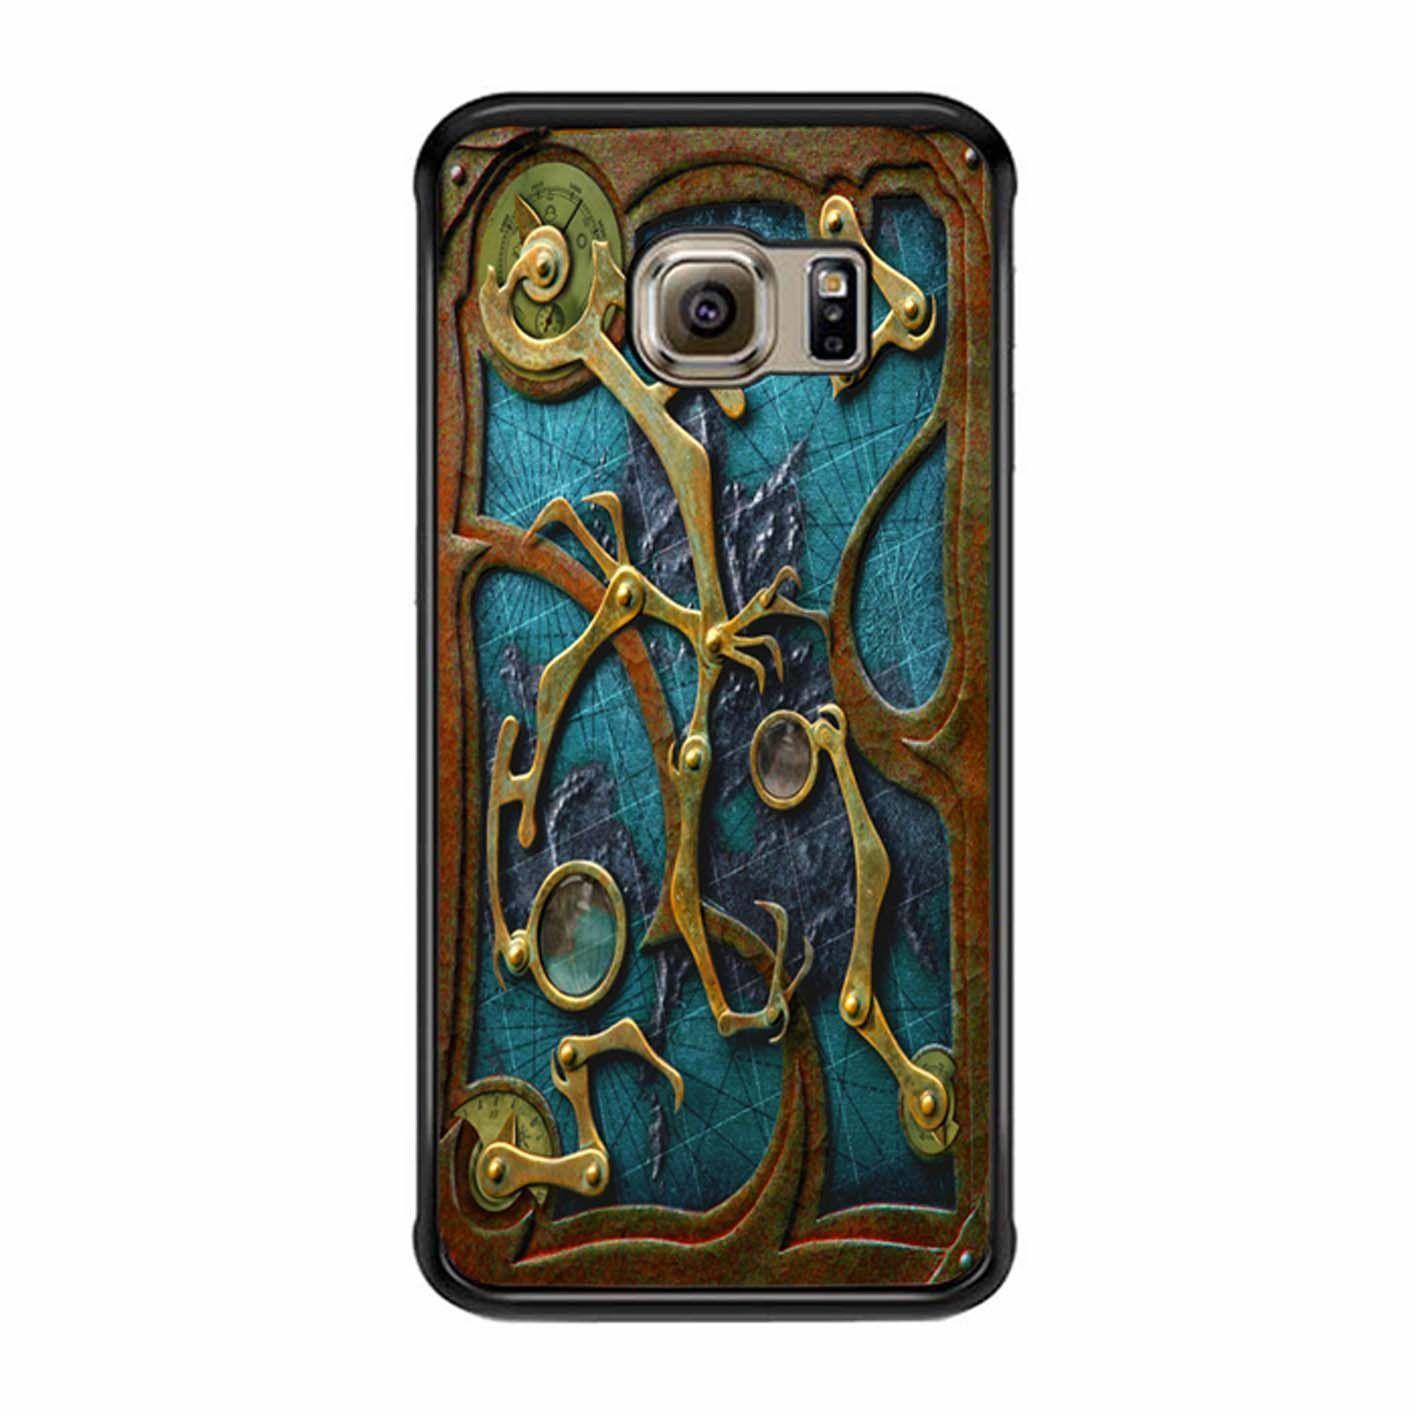 Steampunk Book Cover Samsung Galaxy S6 Edge Case | I want ...